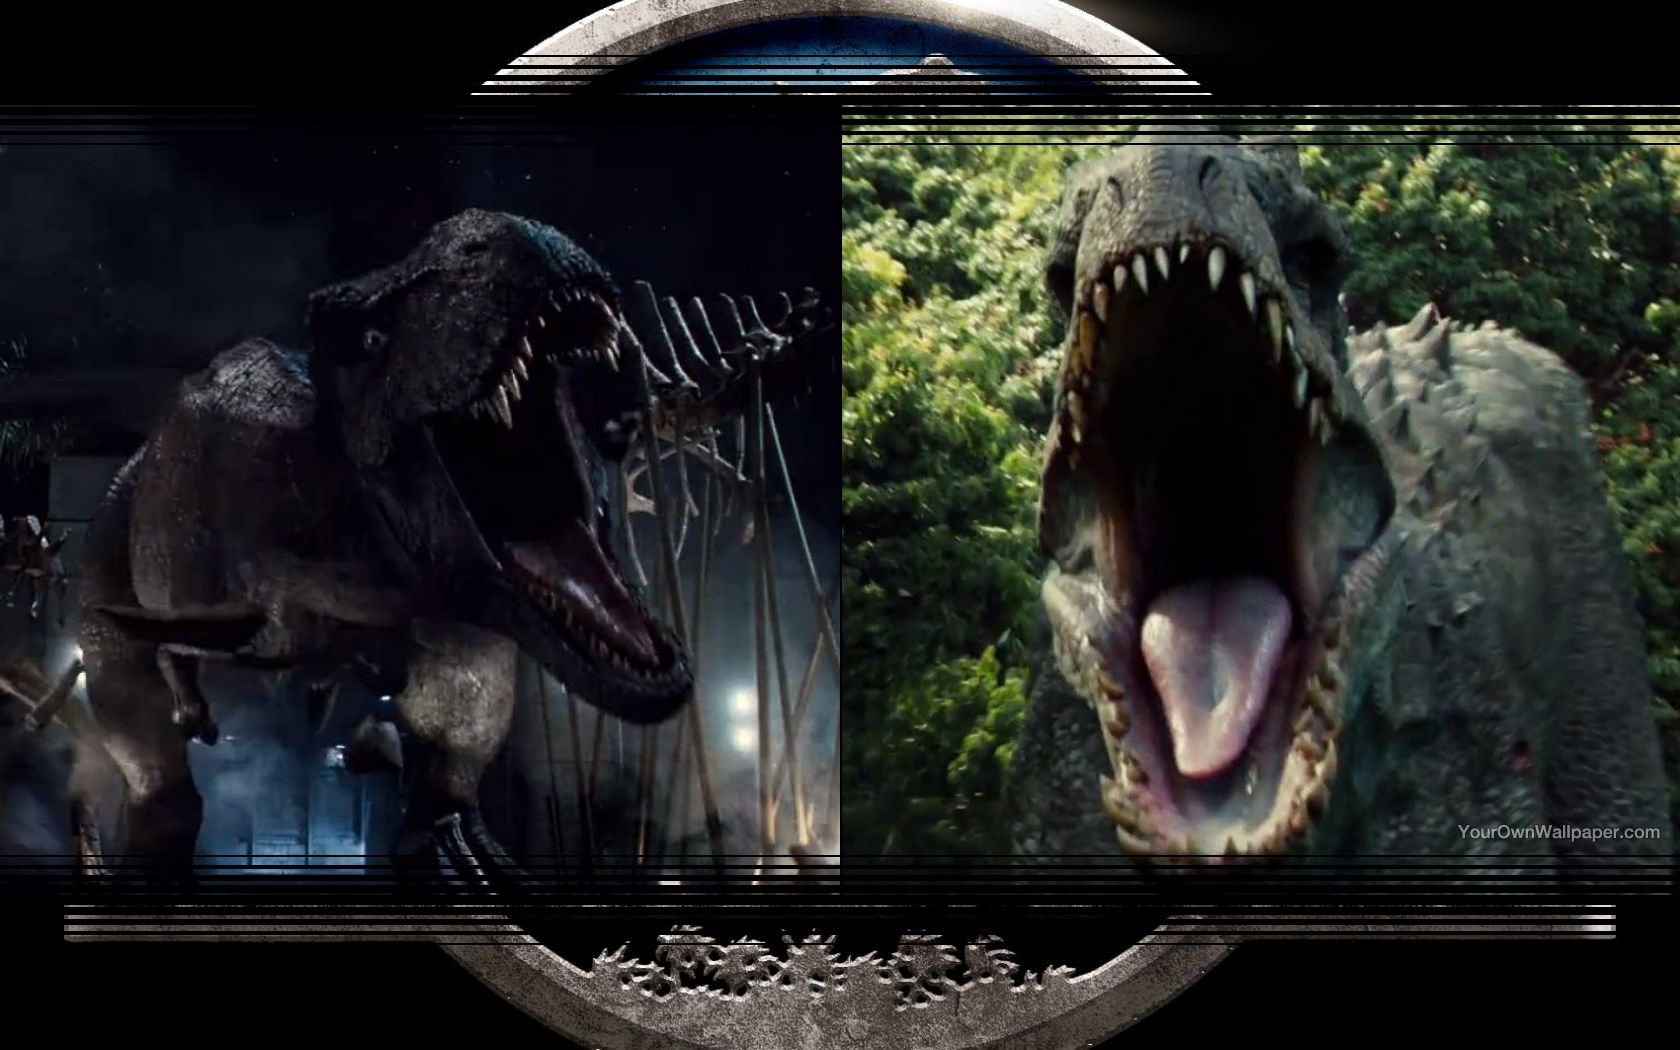 Tyrannosaurus Rex Vs Indominus Rex Wallpaper By Weissdrum On